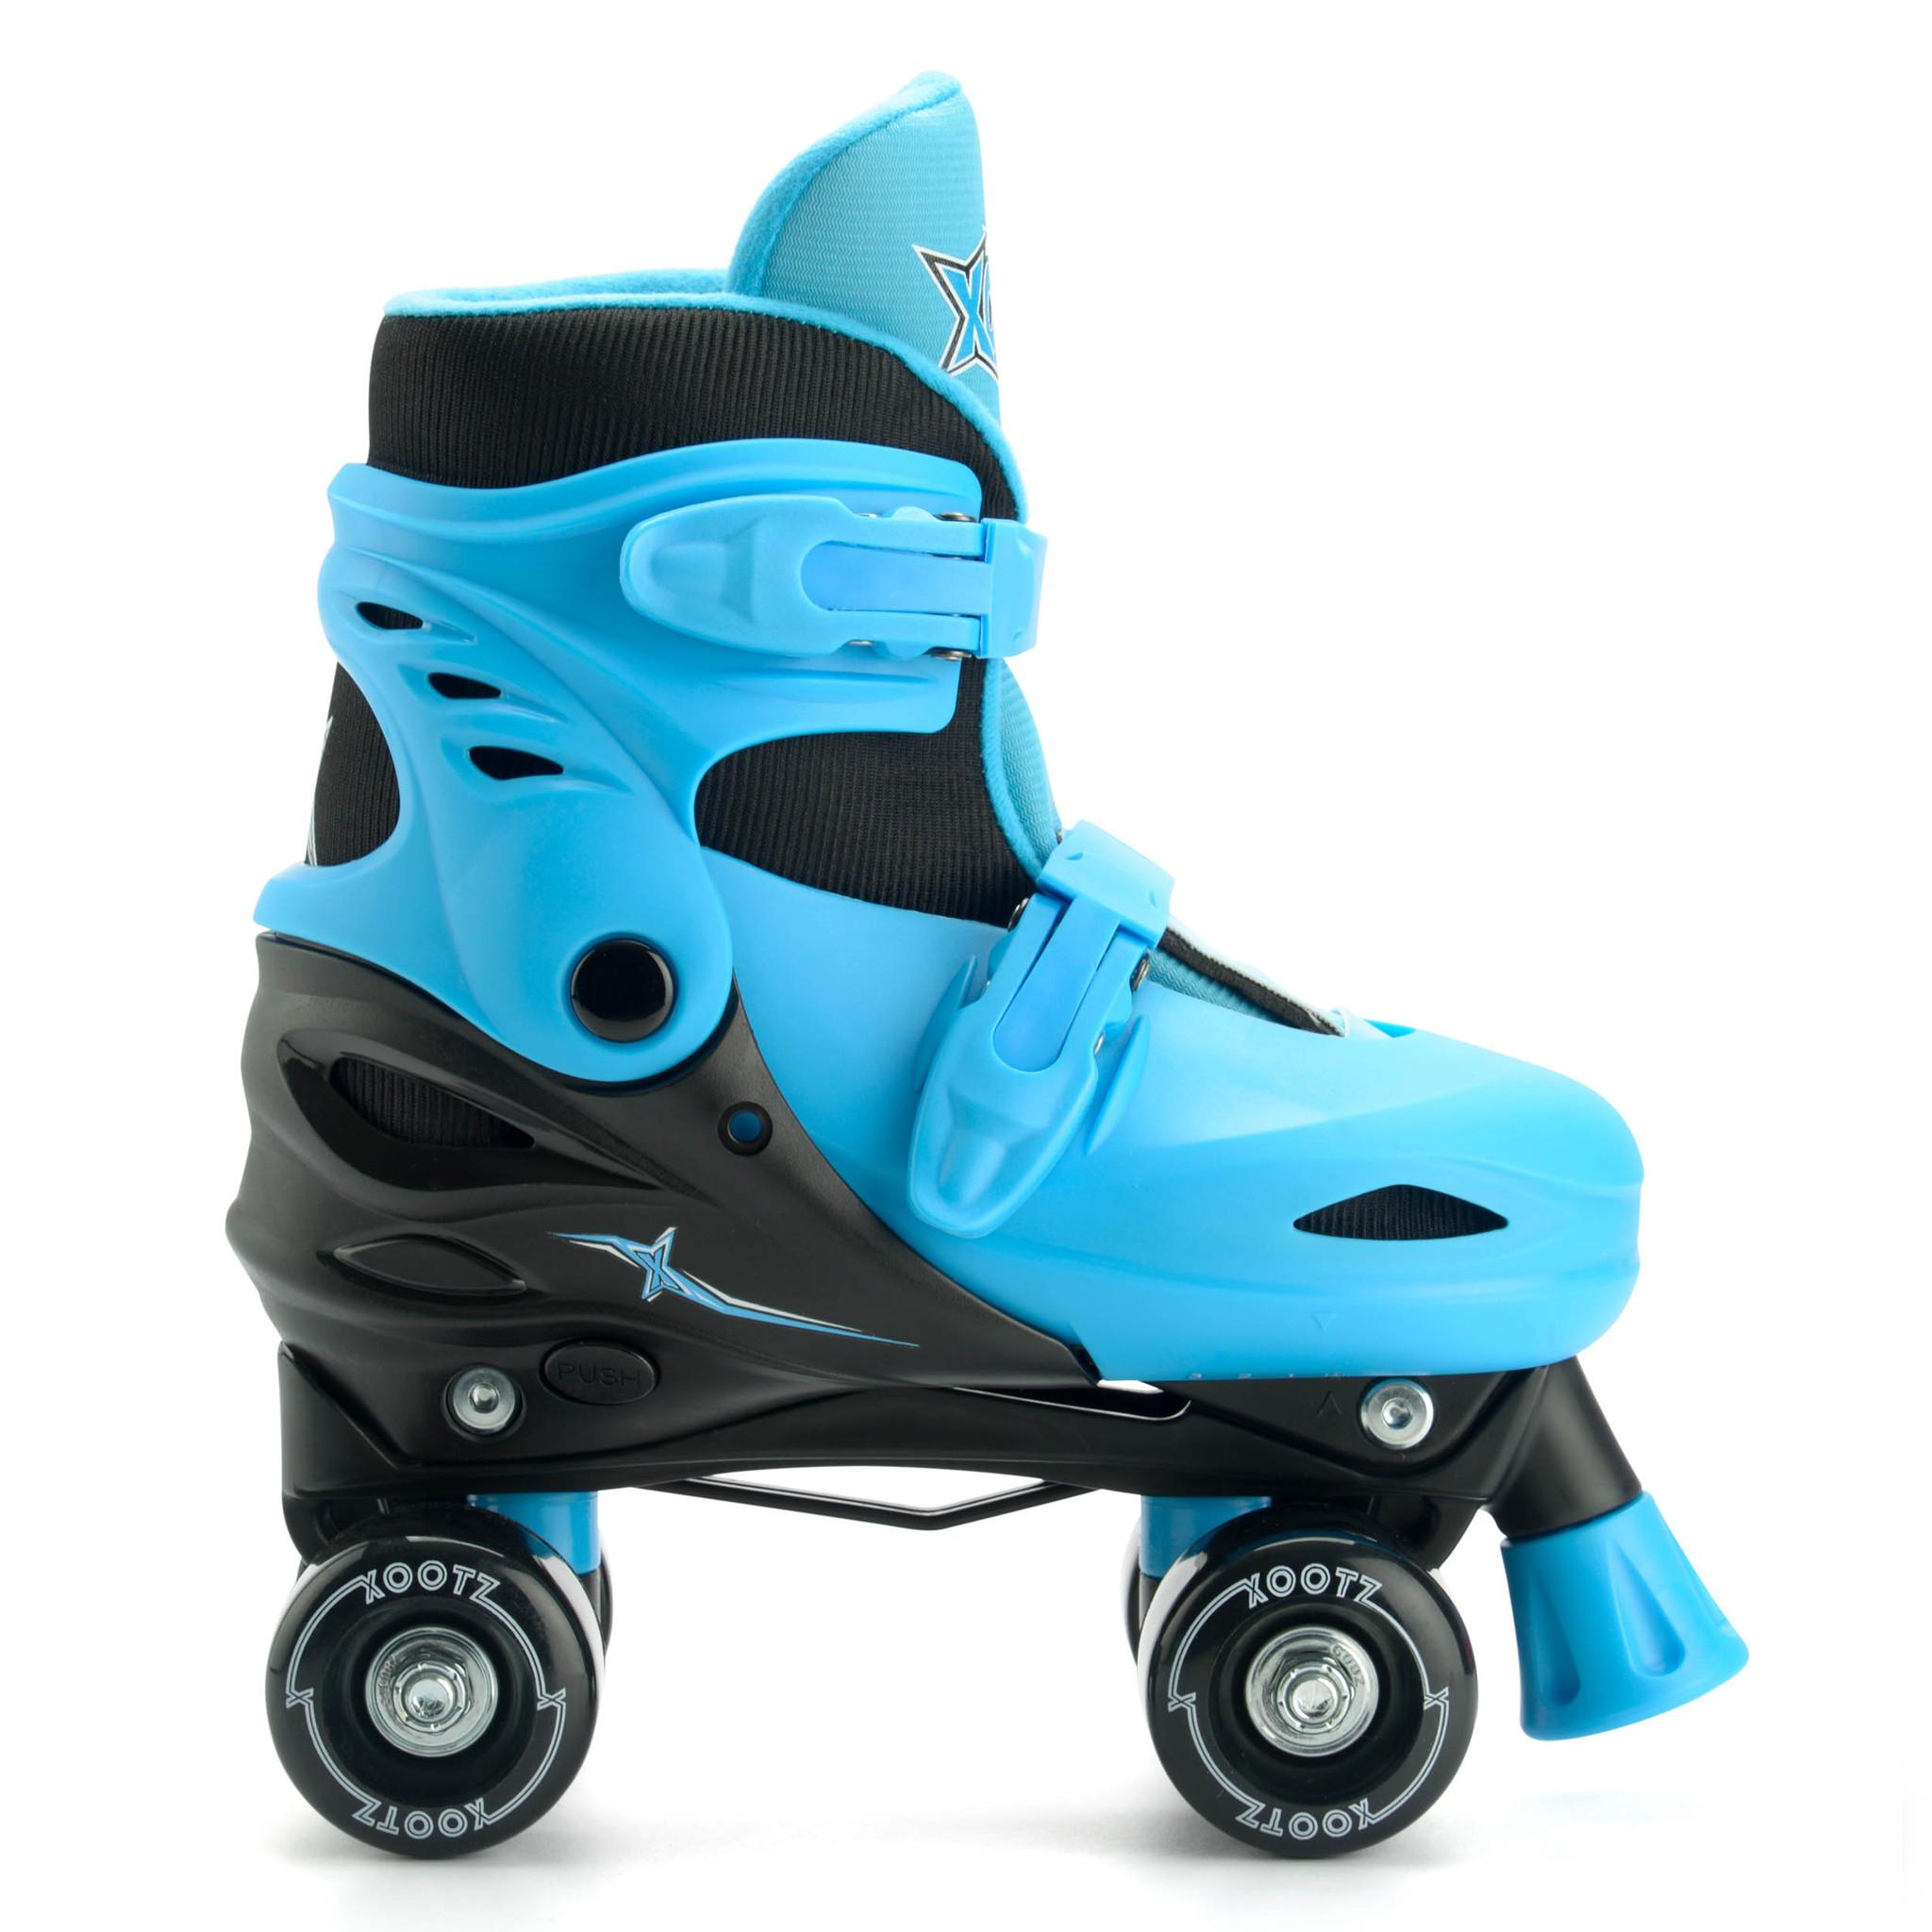 TY6064 xootz quad skates blue